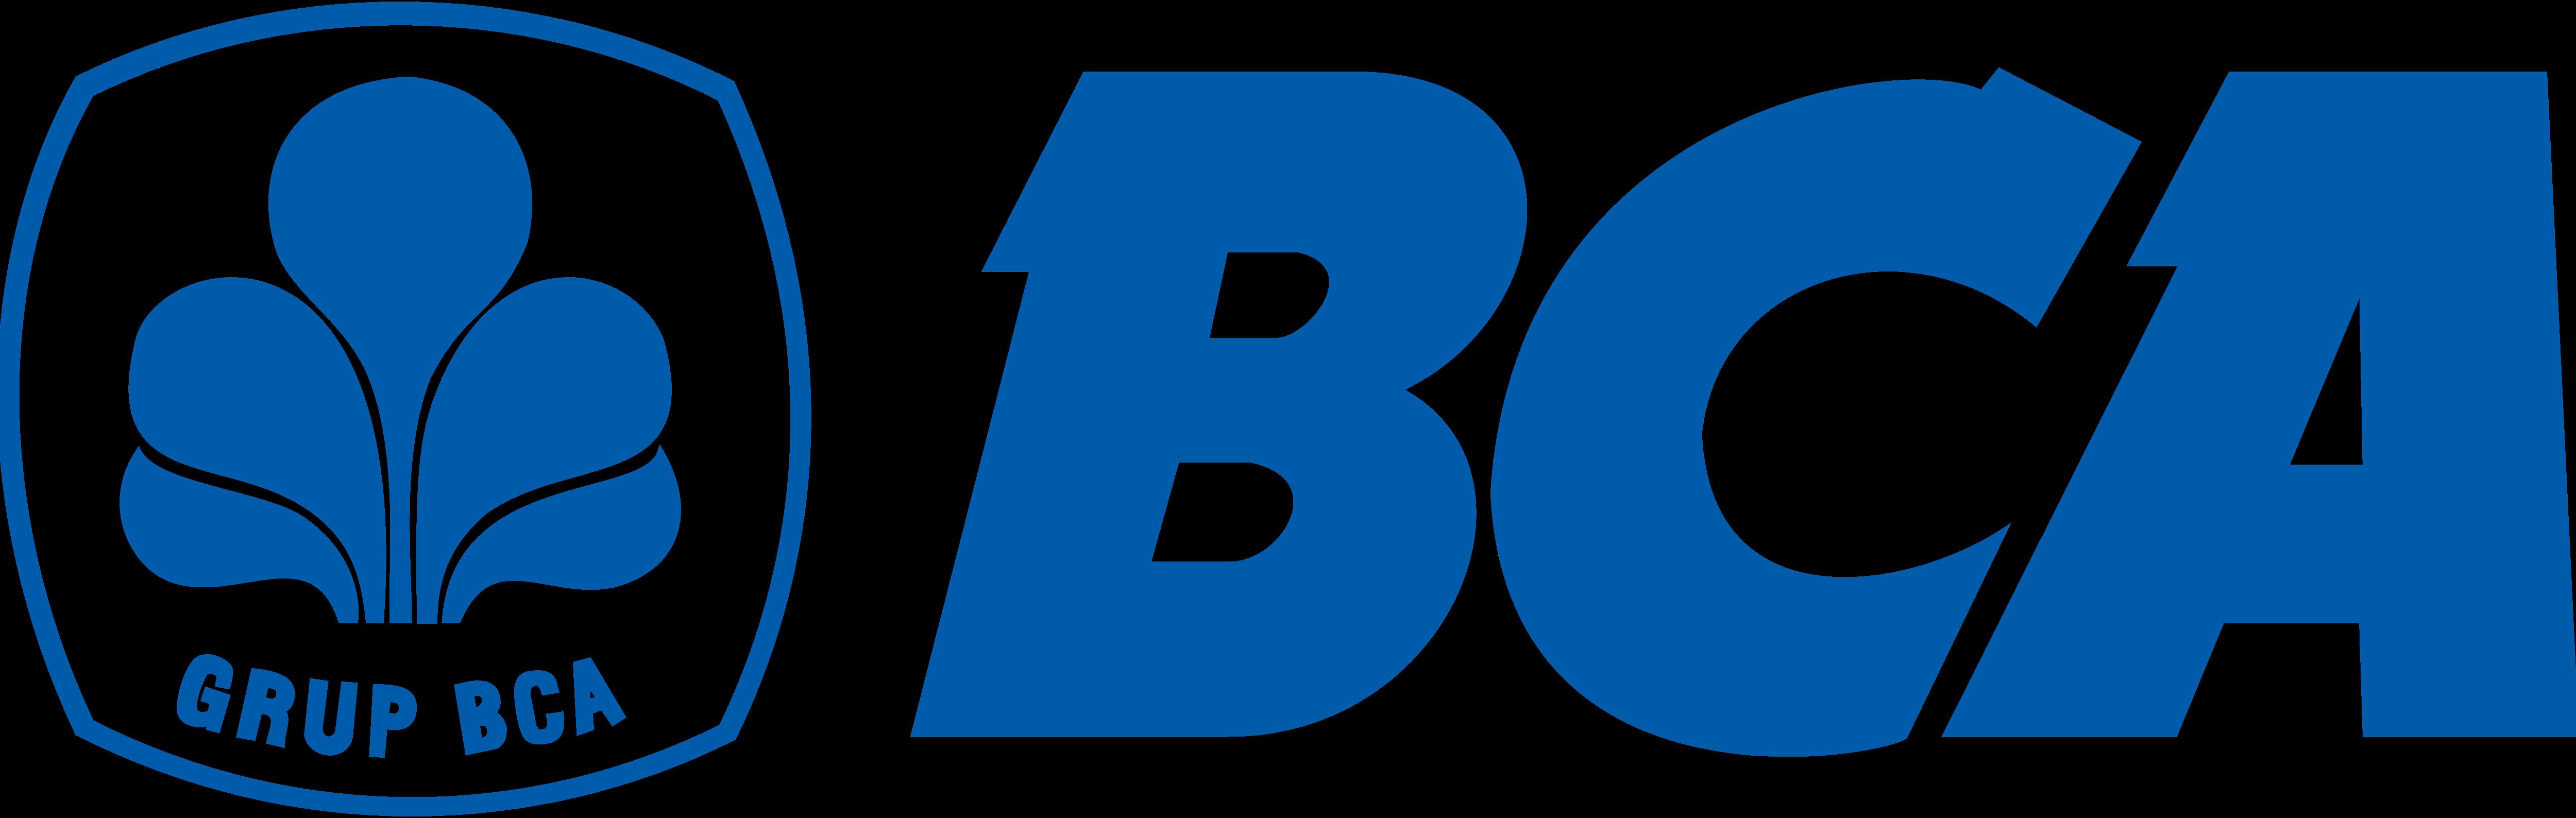 BCA_logo_Bank_Central_Asia.png